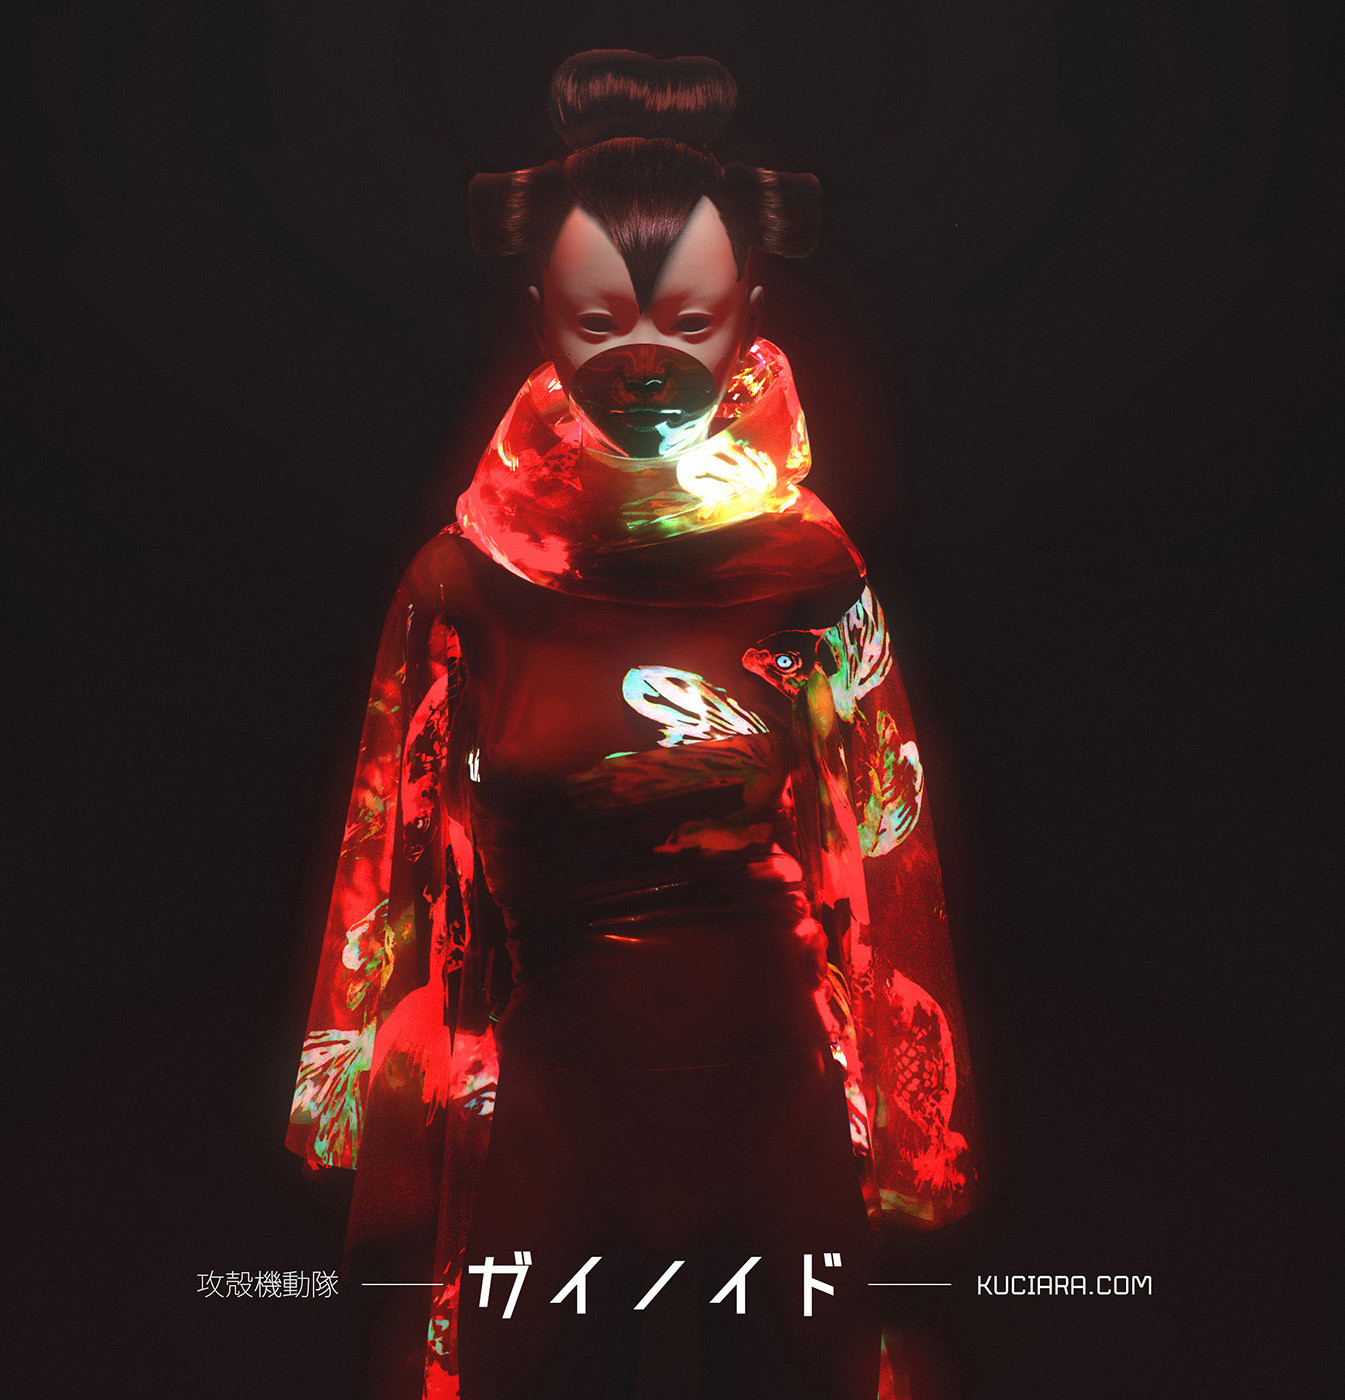 Maciej kuciara 150807 cha geisha kimono mk cam01 v002